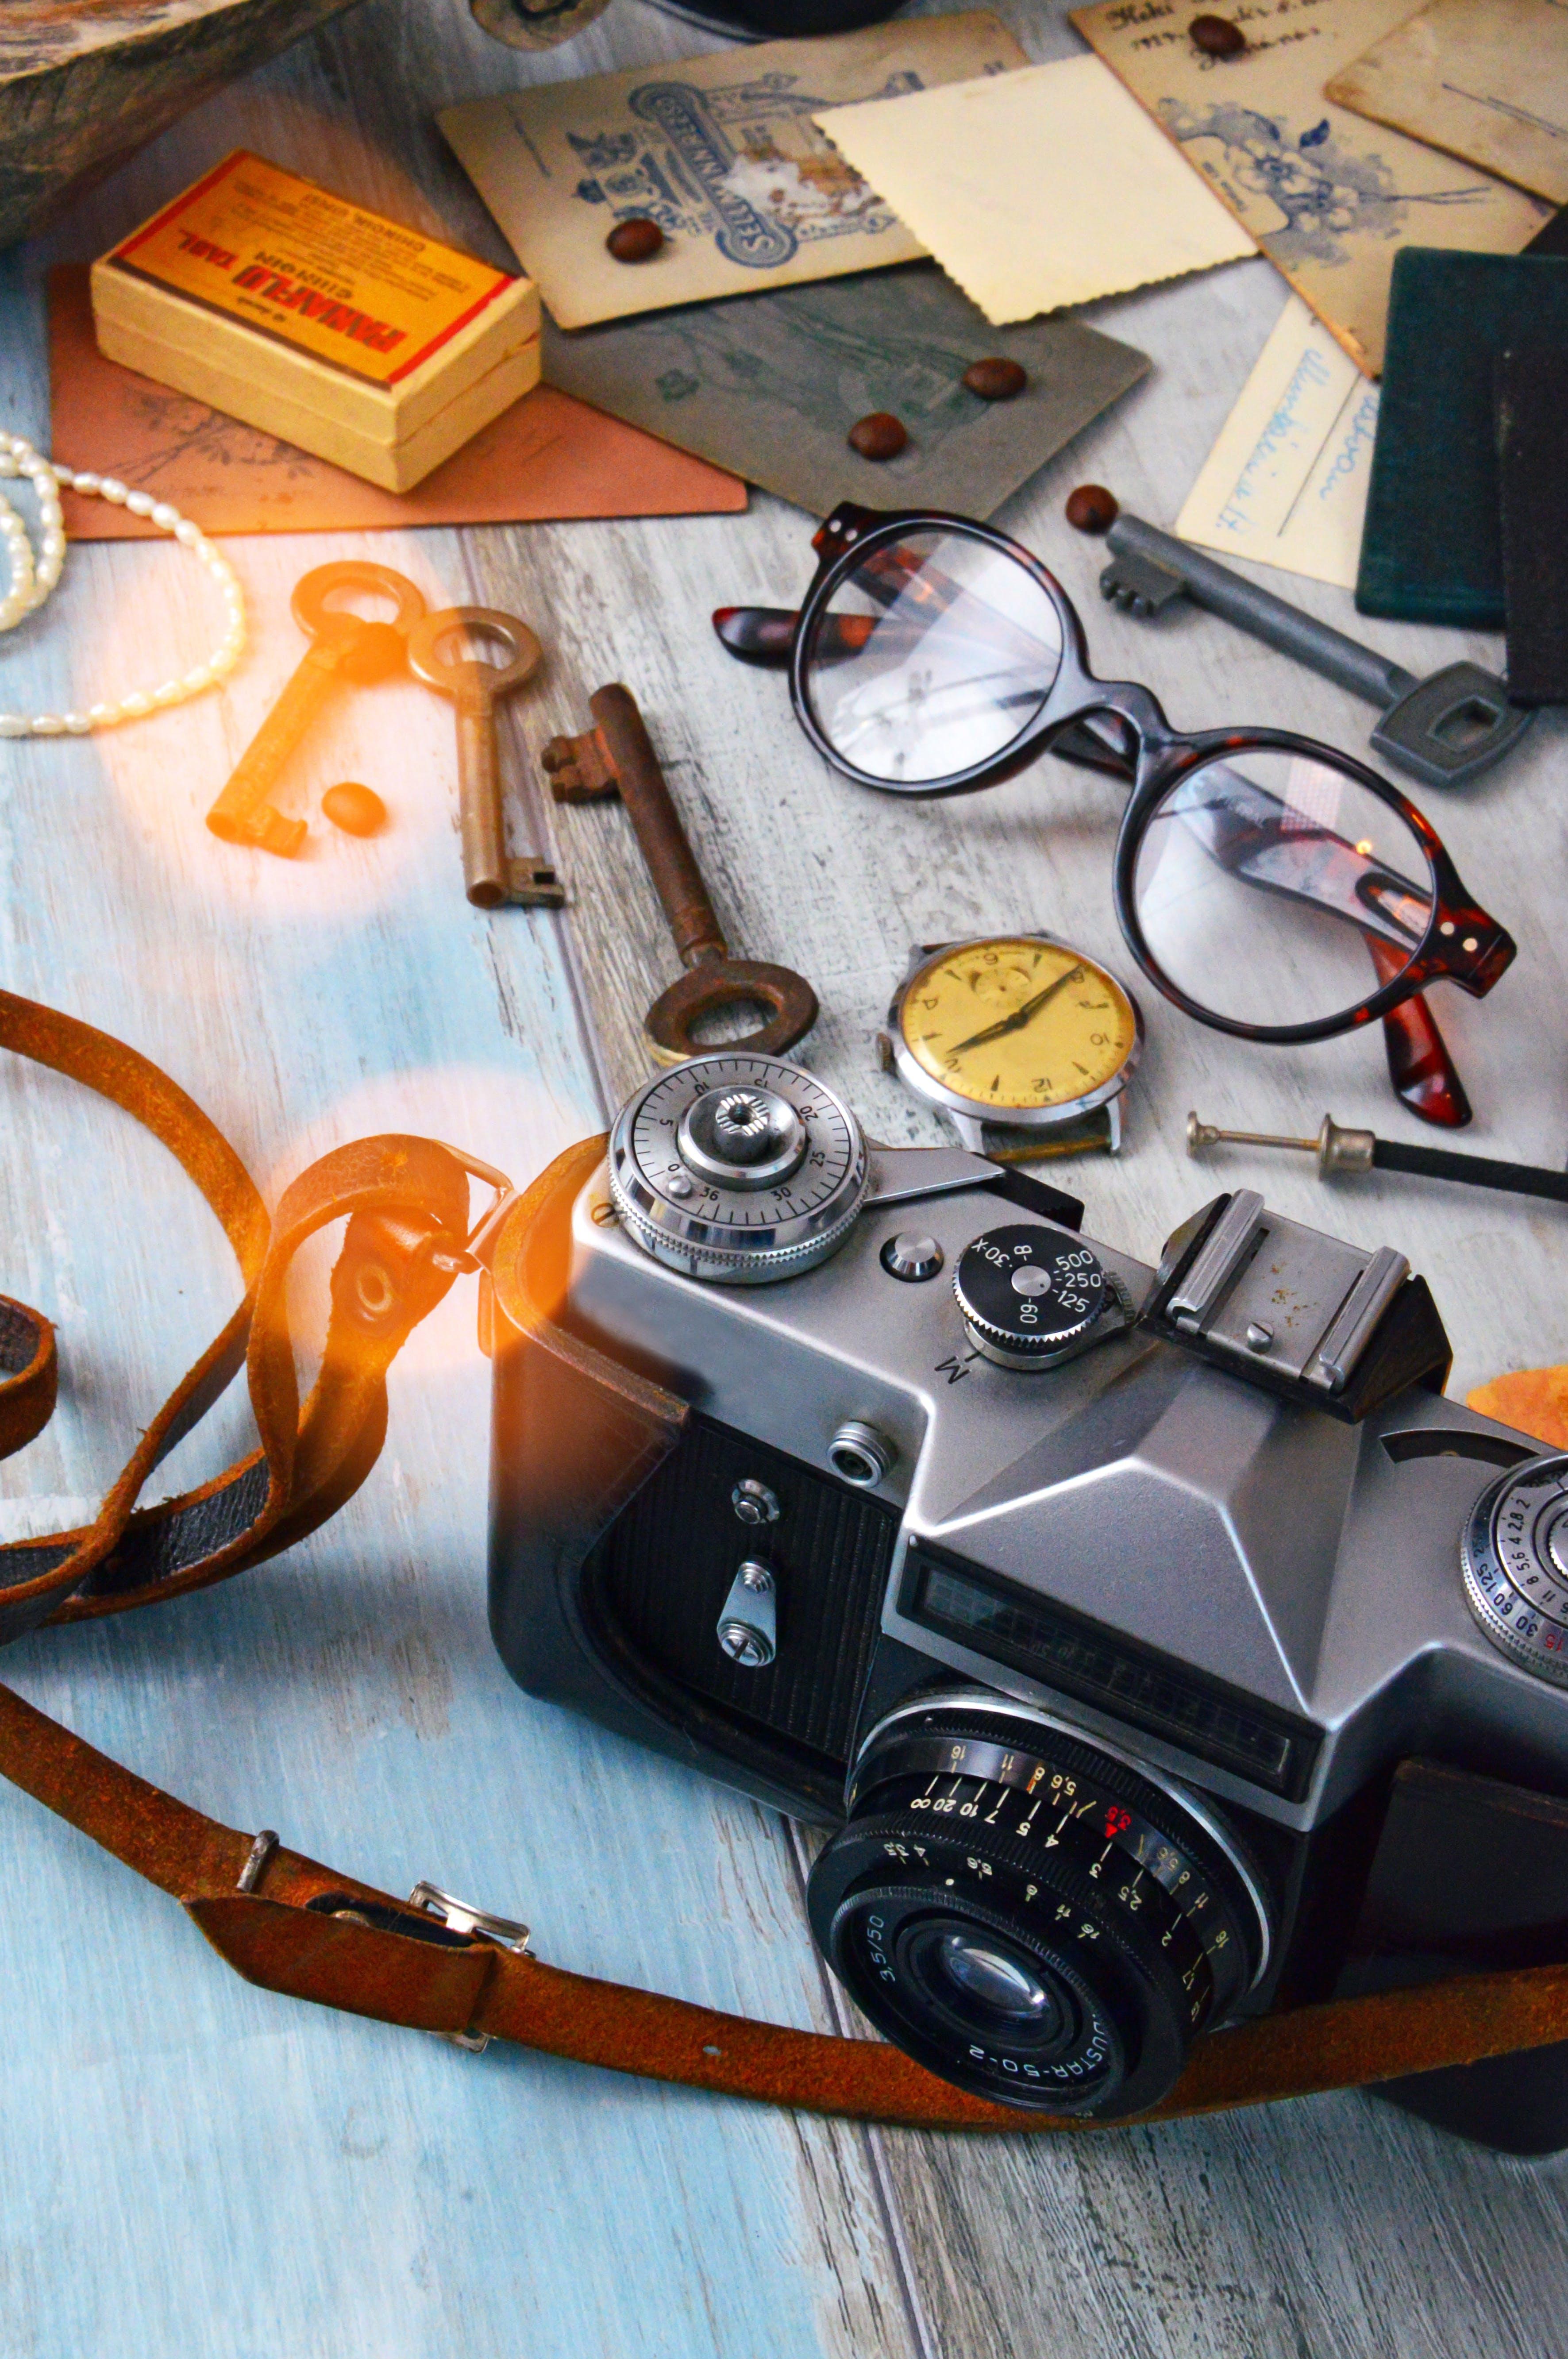 Black and Gray Camera, Skeleton Keys, and Brown Framed Eyeglasses on Gray Surface